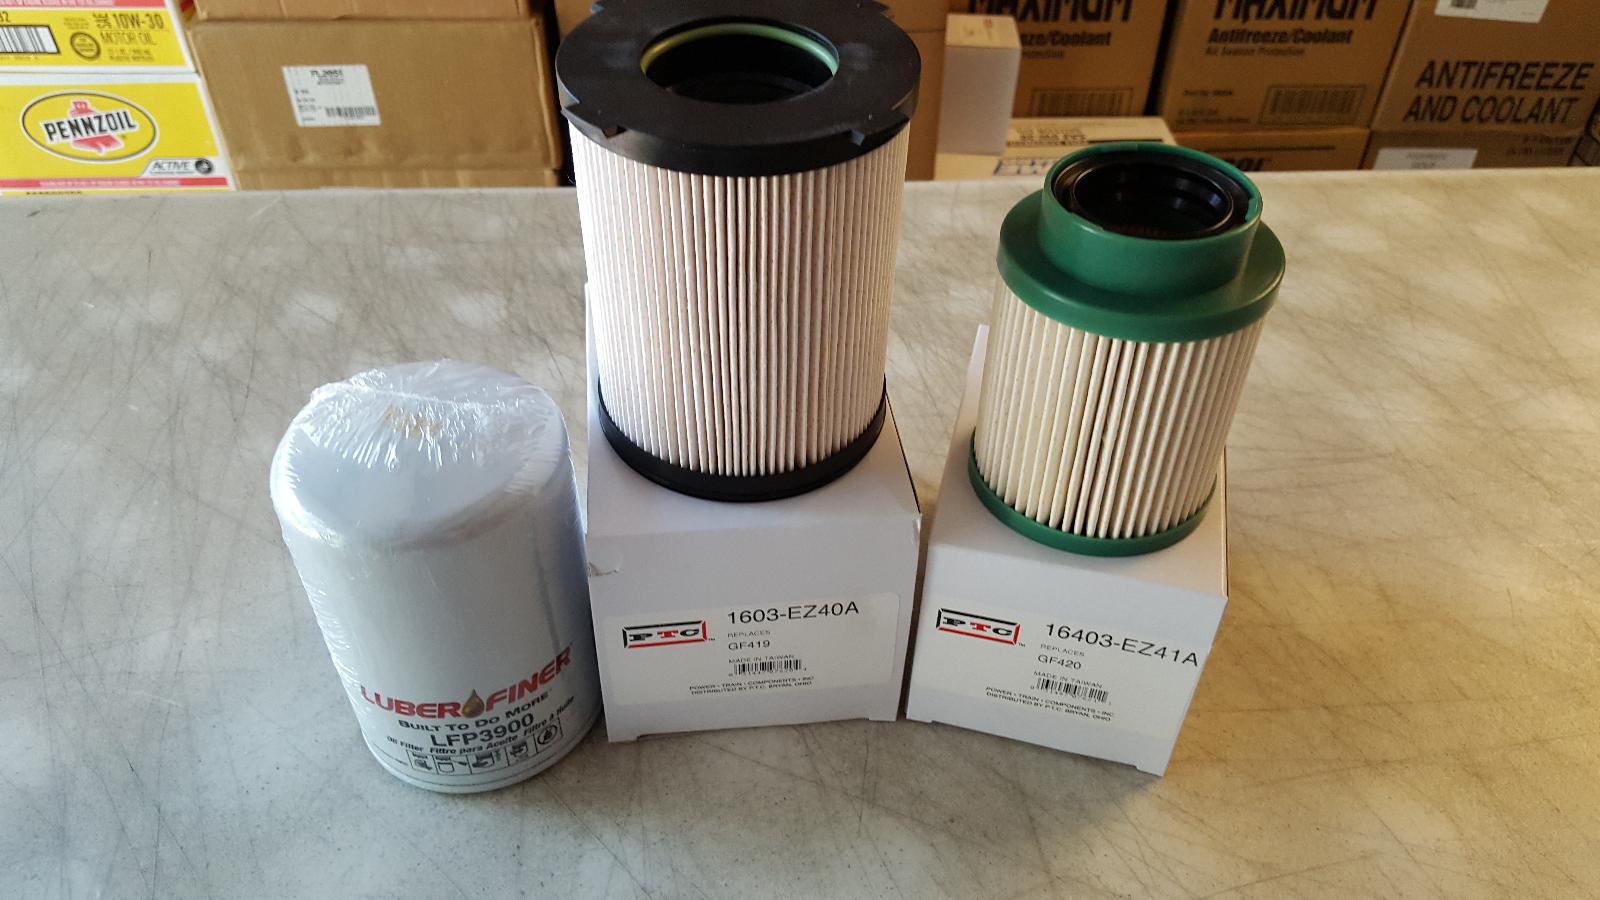 nissan titan fuel filter 2011 nissan xterra fuel filter amazing nissan titan xd 5.0 diesel oil and fuel filter kit ...